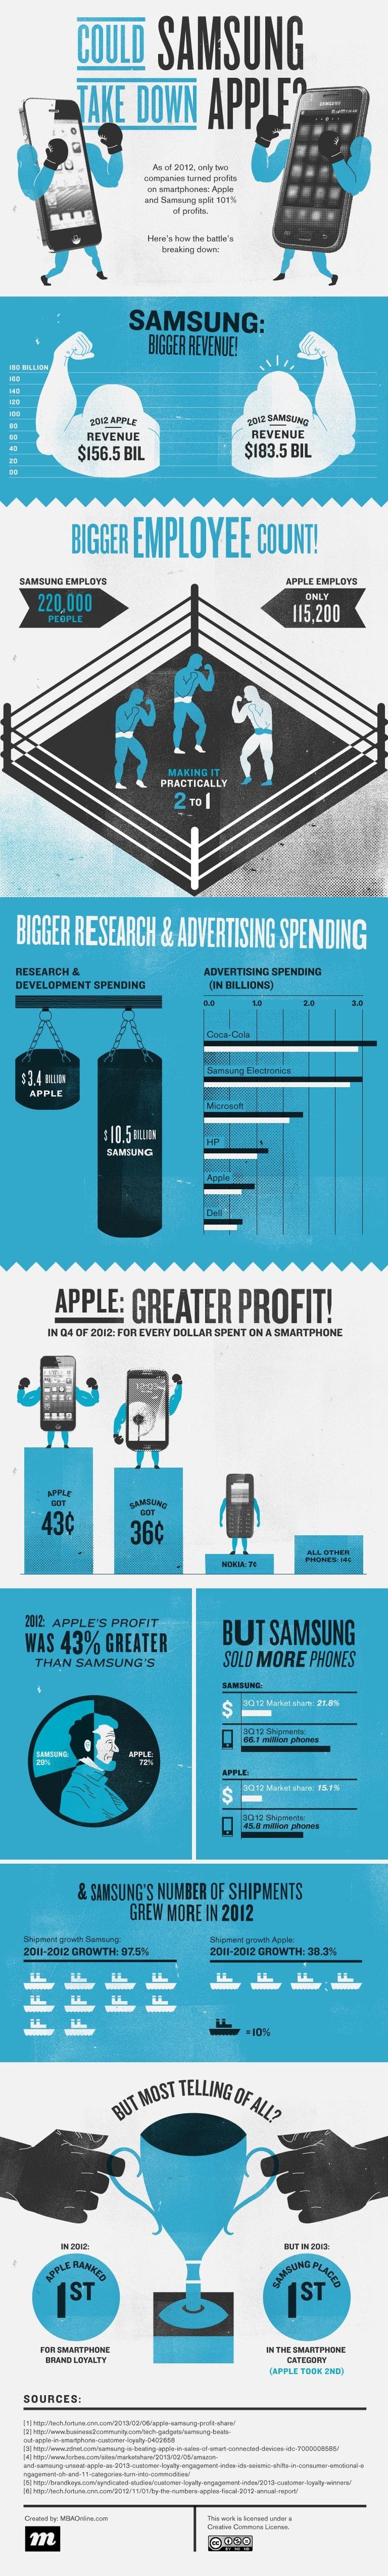 15 best iPad vs Samsung images on Pinterest